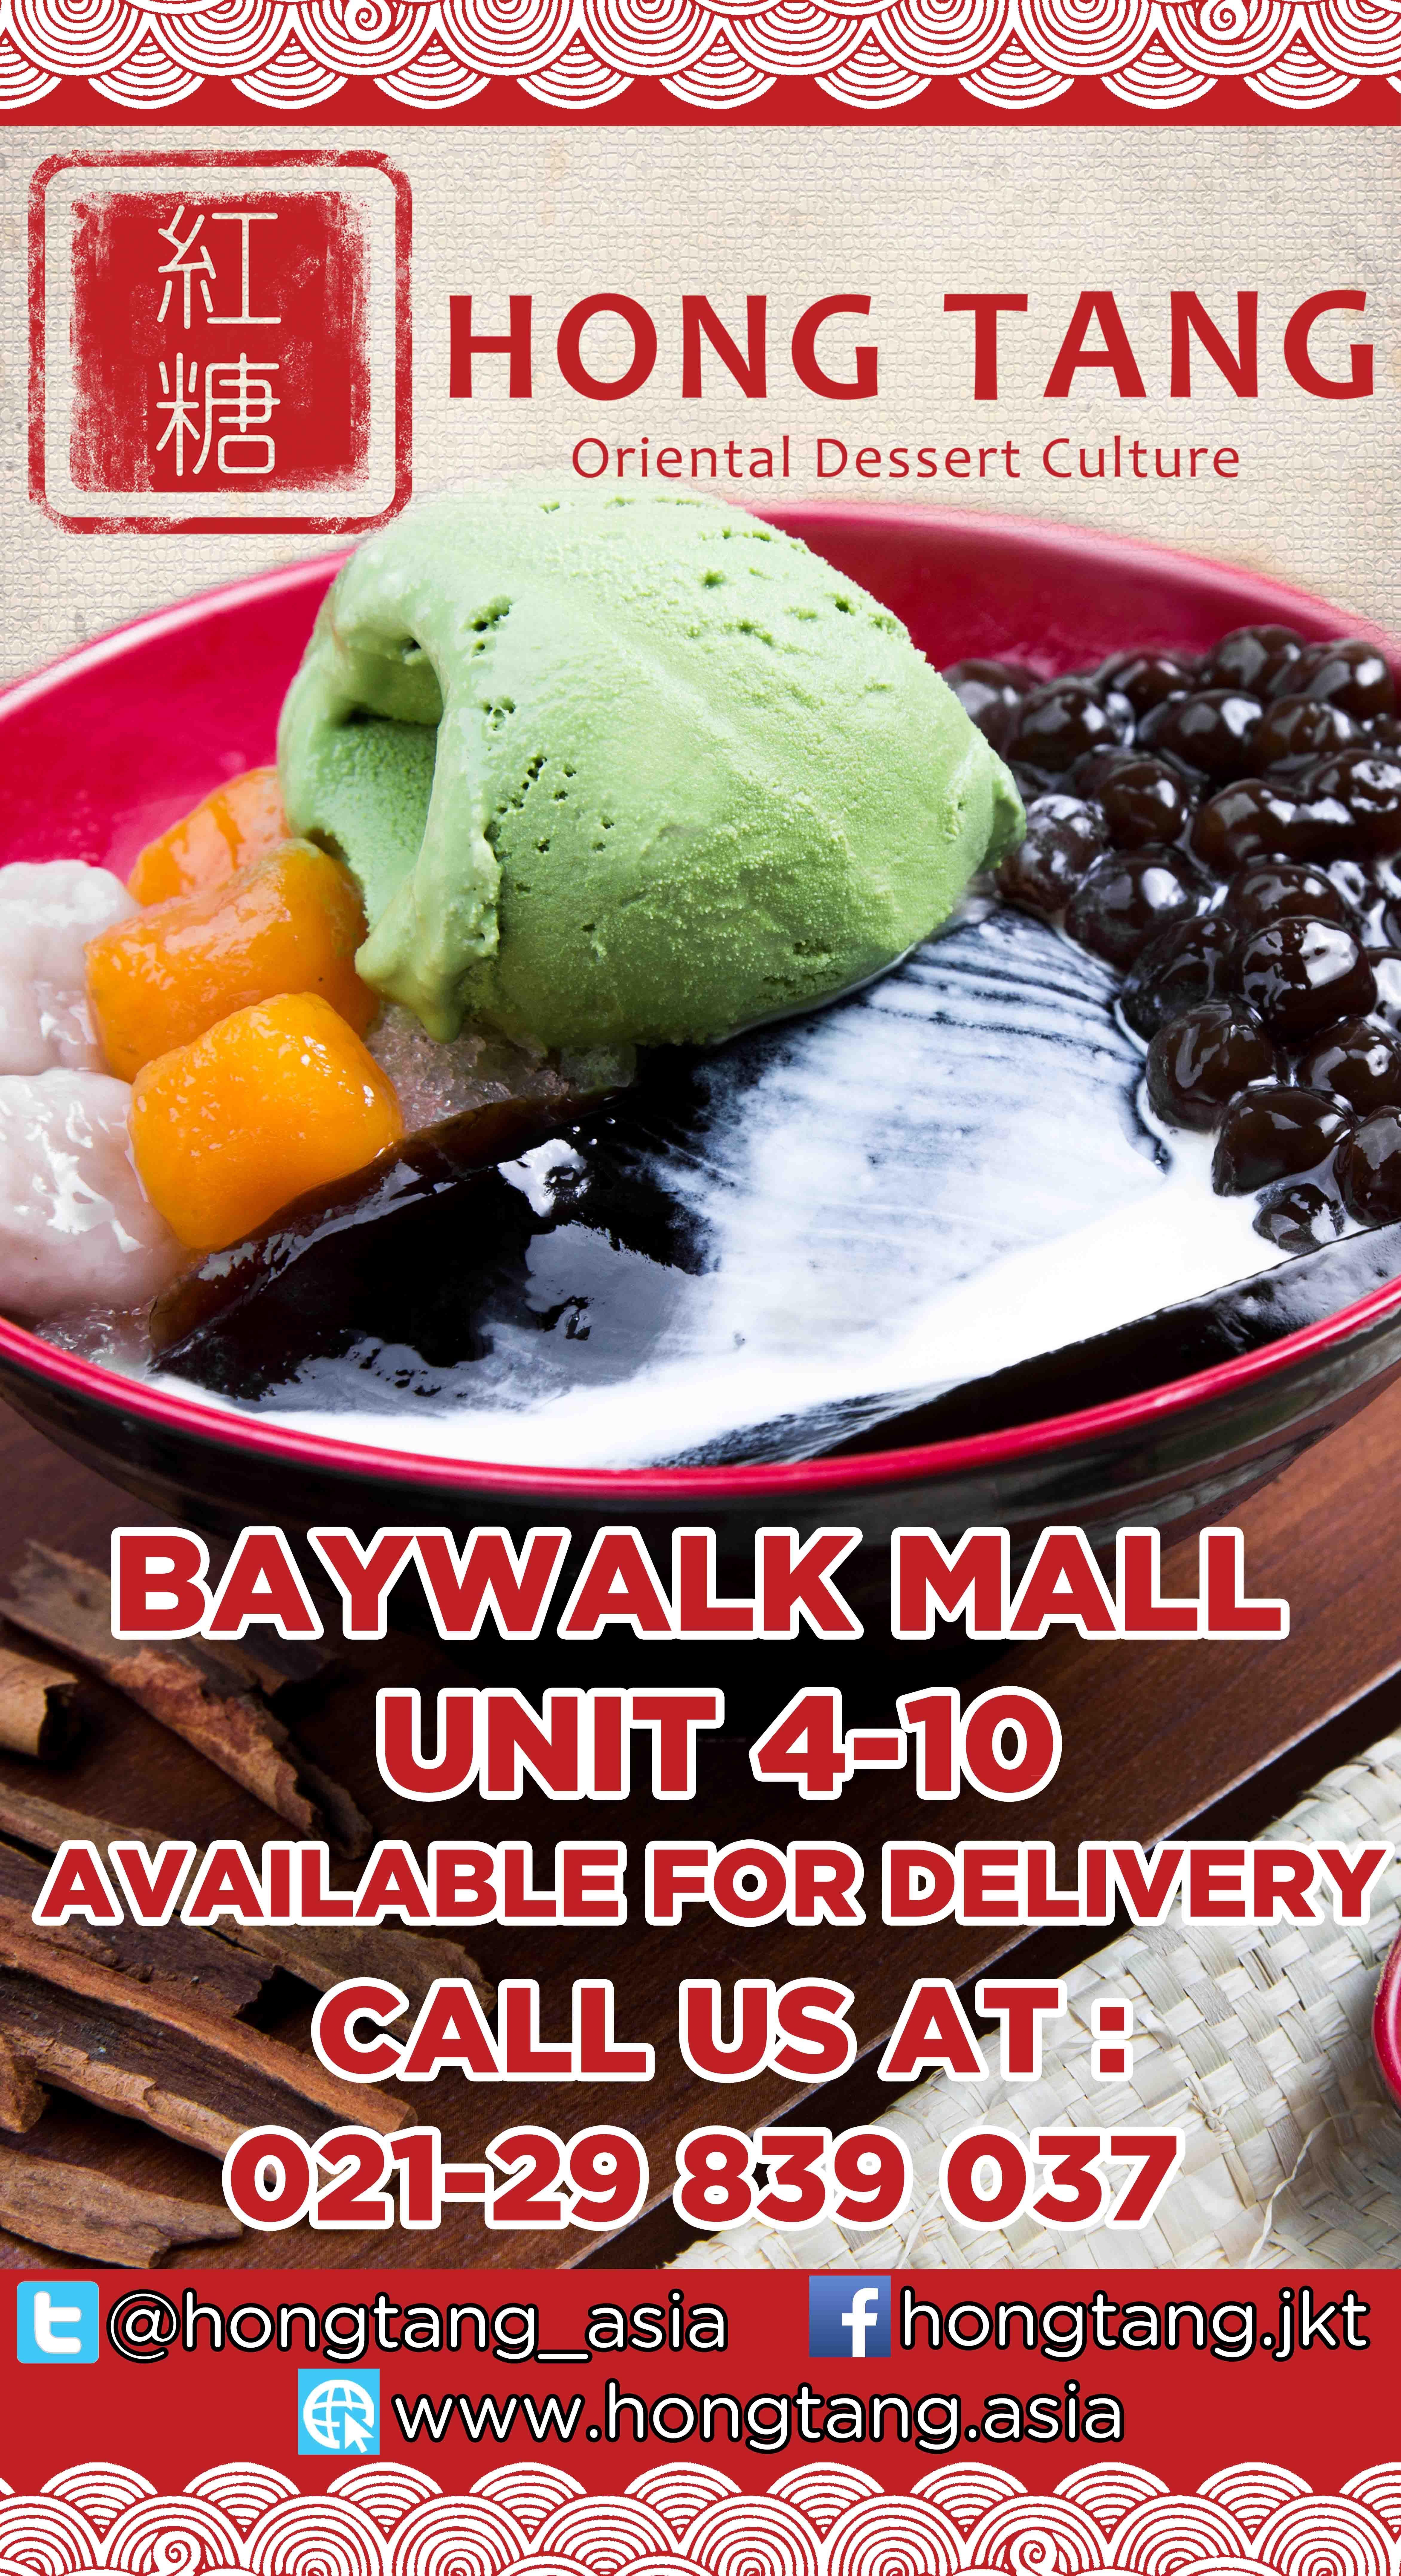 Available Deloivery Hongtang Baywalk Mall